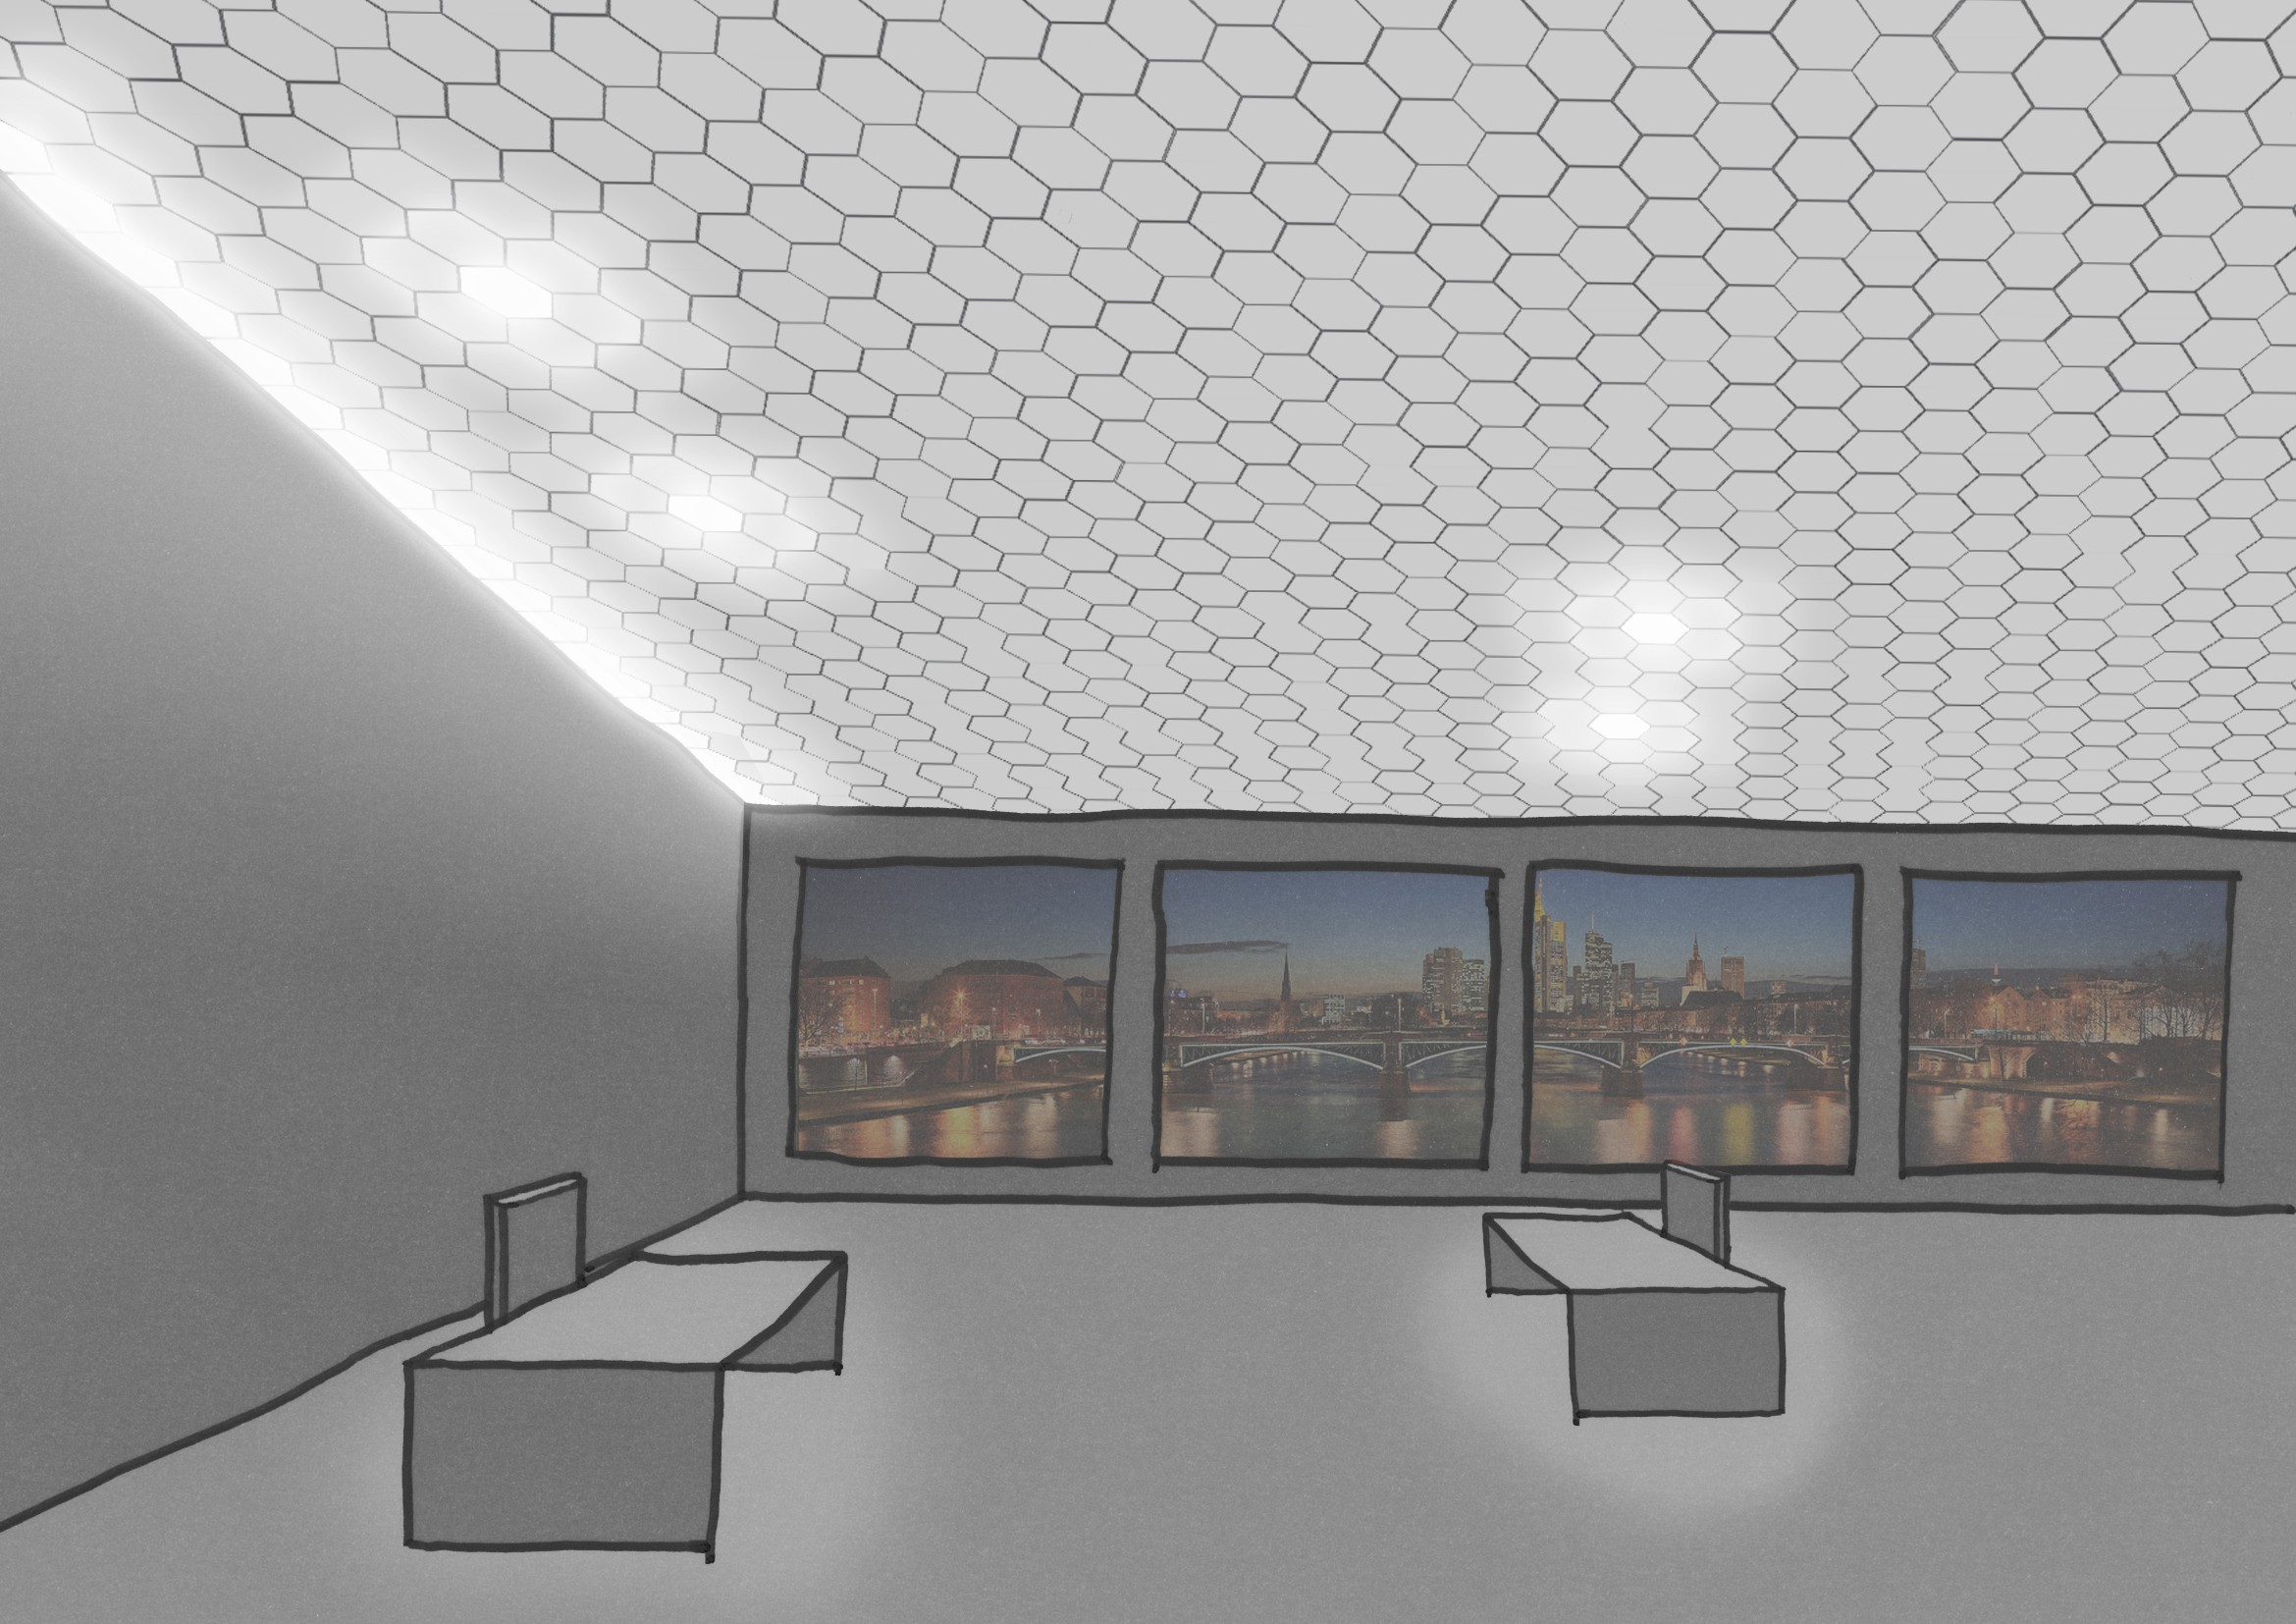 Luminous ceilings hochschule wismar fakultät gestaltung